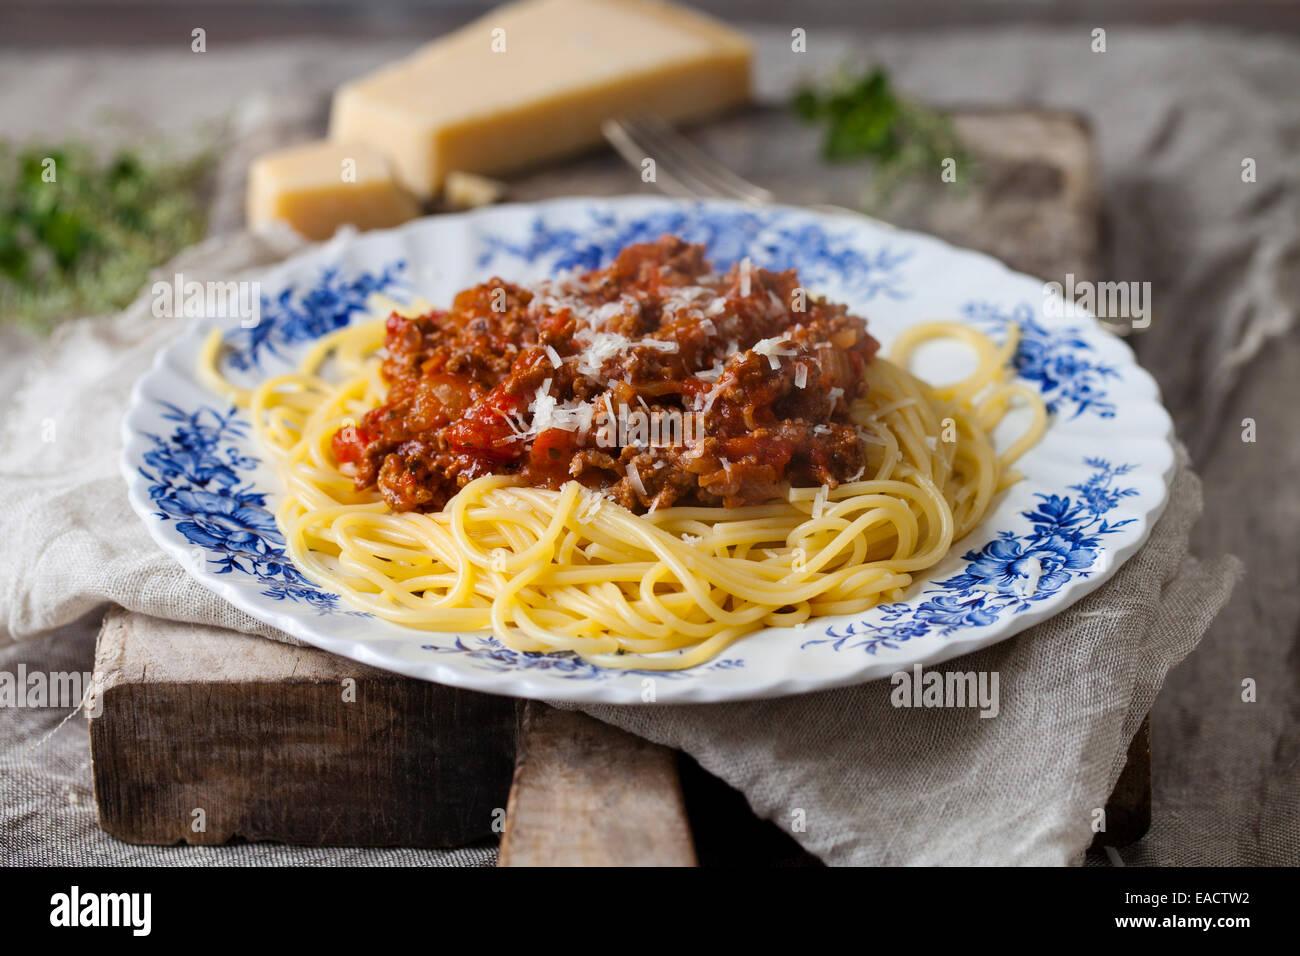 Los espaguetis a la boloñesa Imagen De Stock